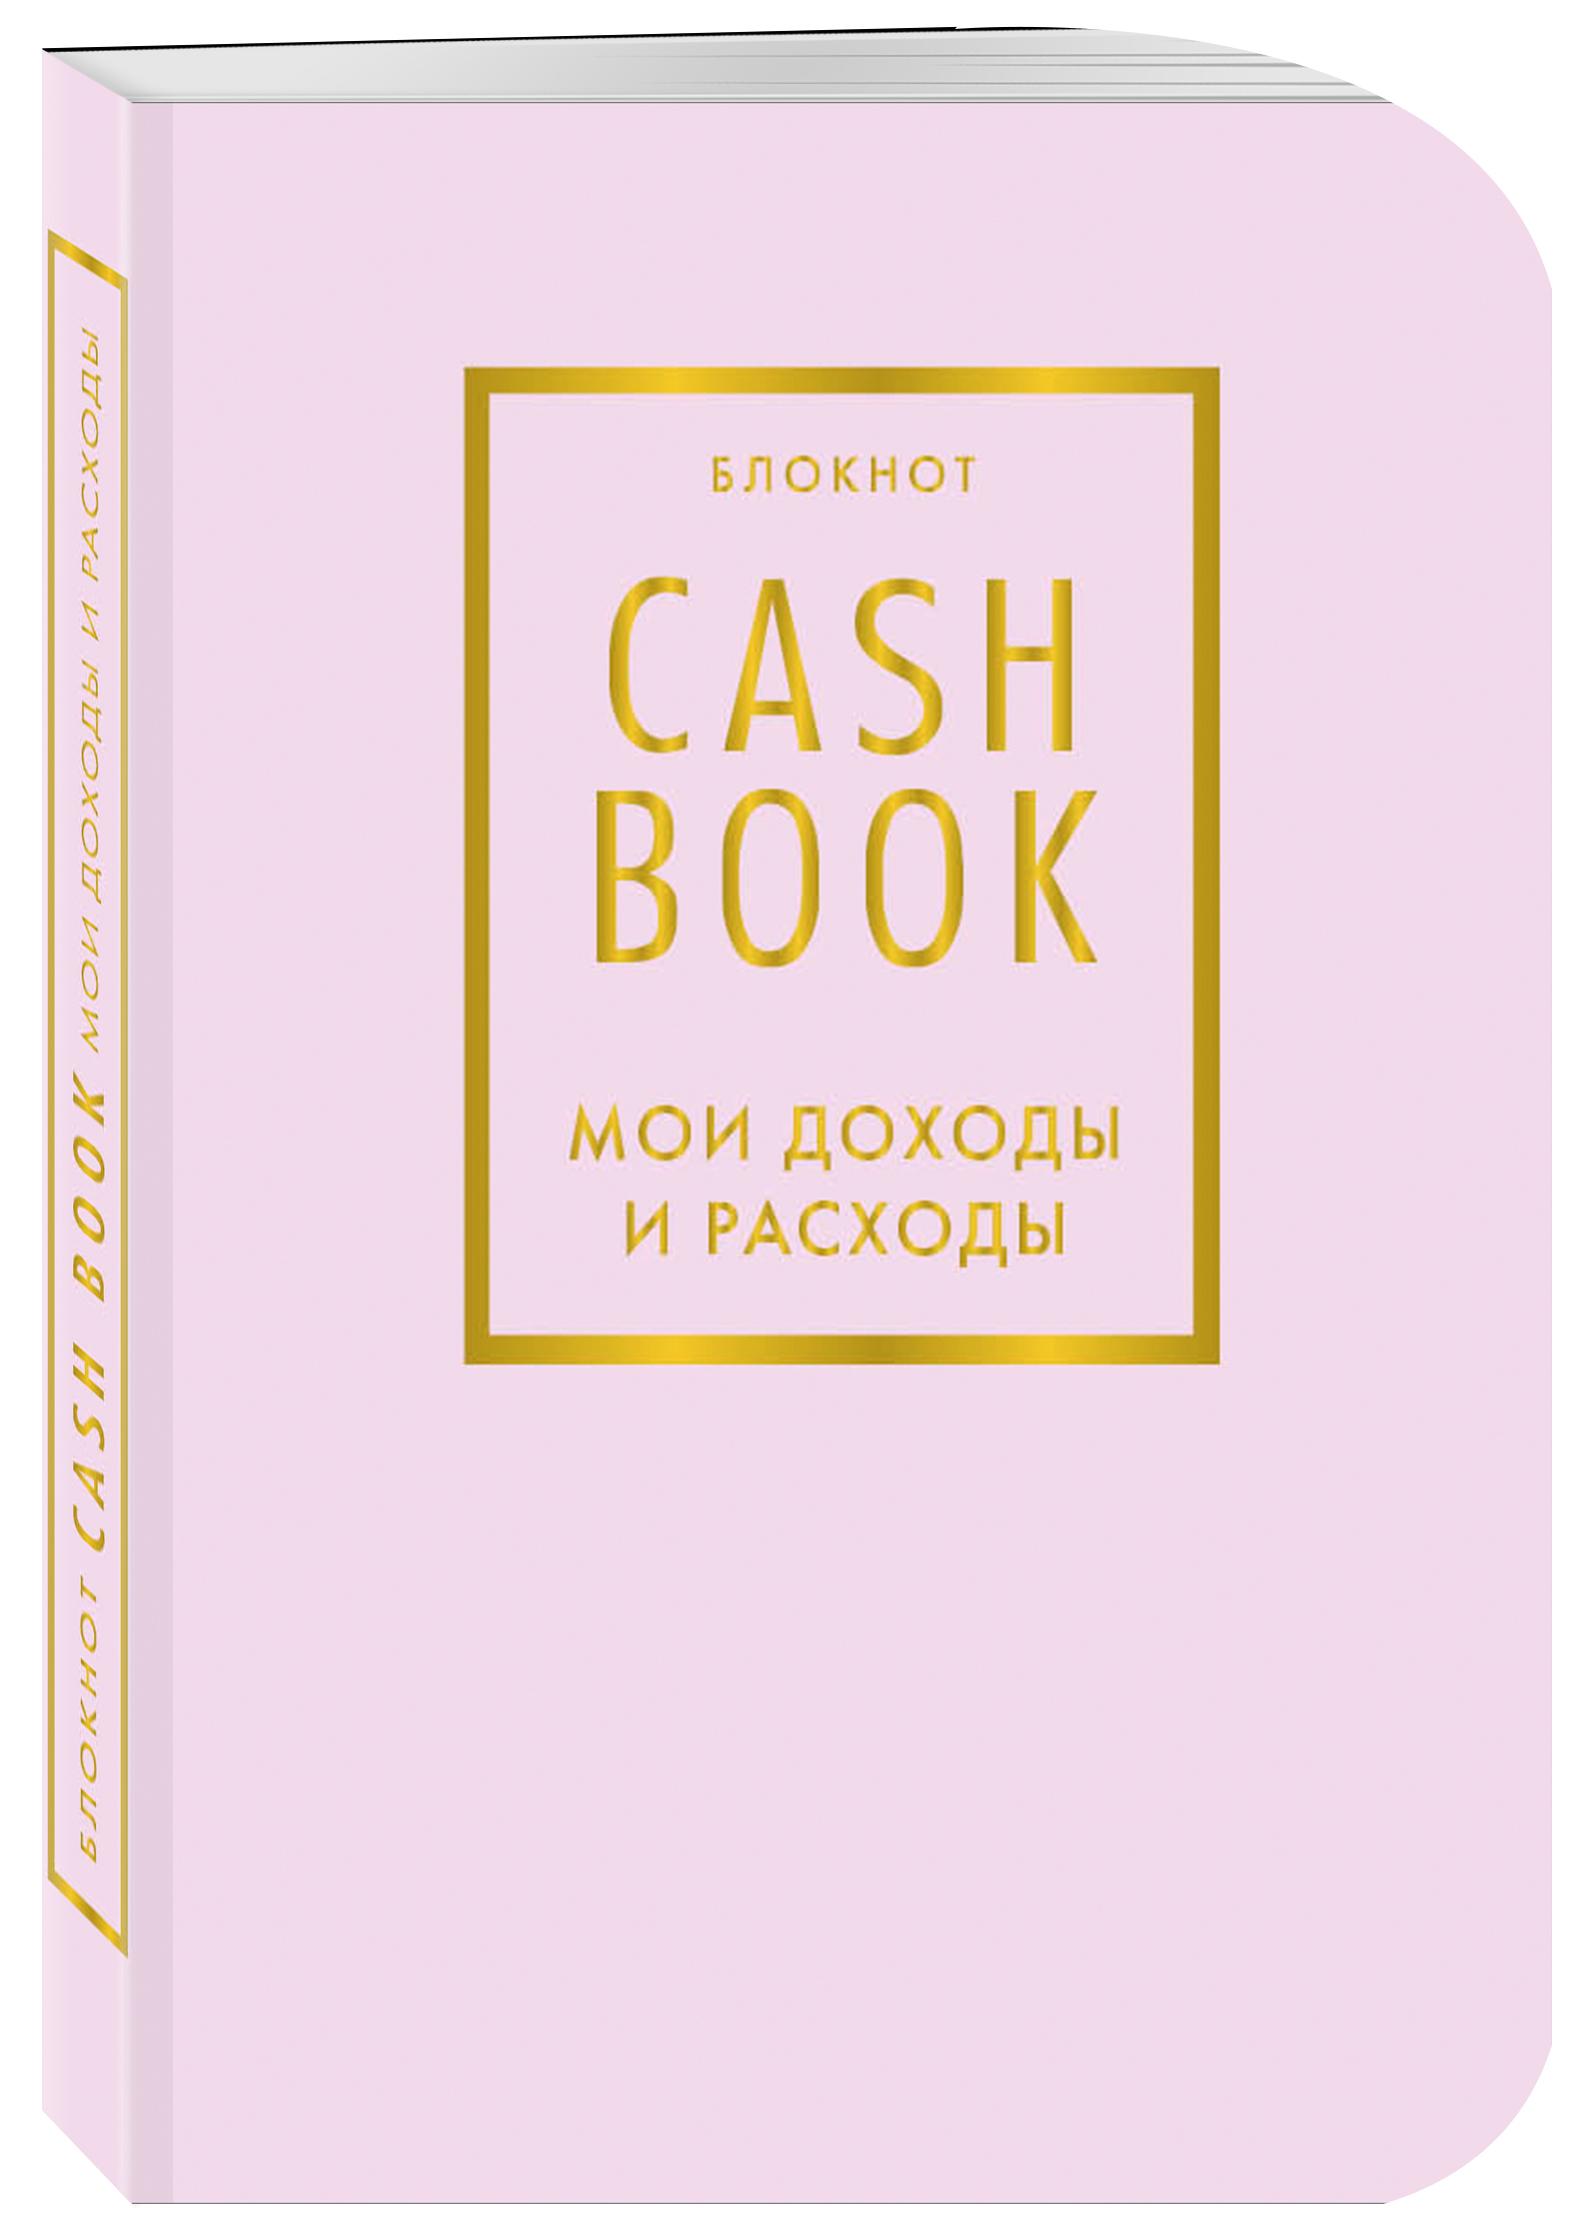 CashBook. Мои доходы и расходы. 6-е издание (лиловый) cashbook мои доходы и расходы 4 е изд 3 е оф